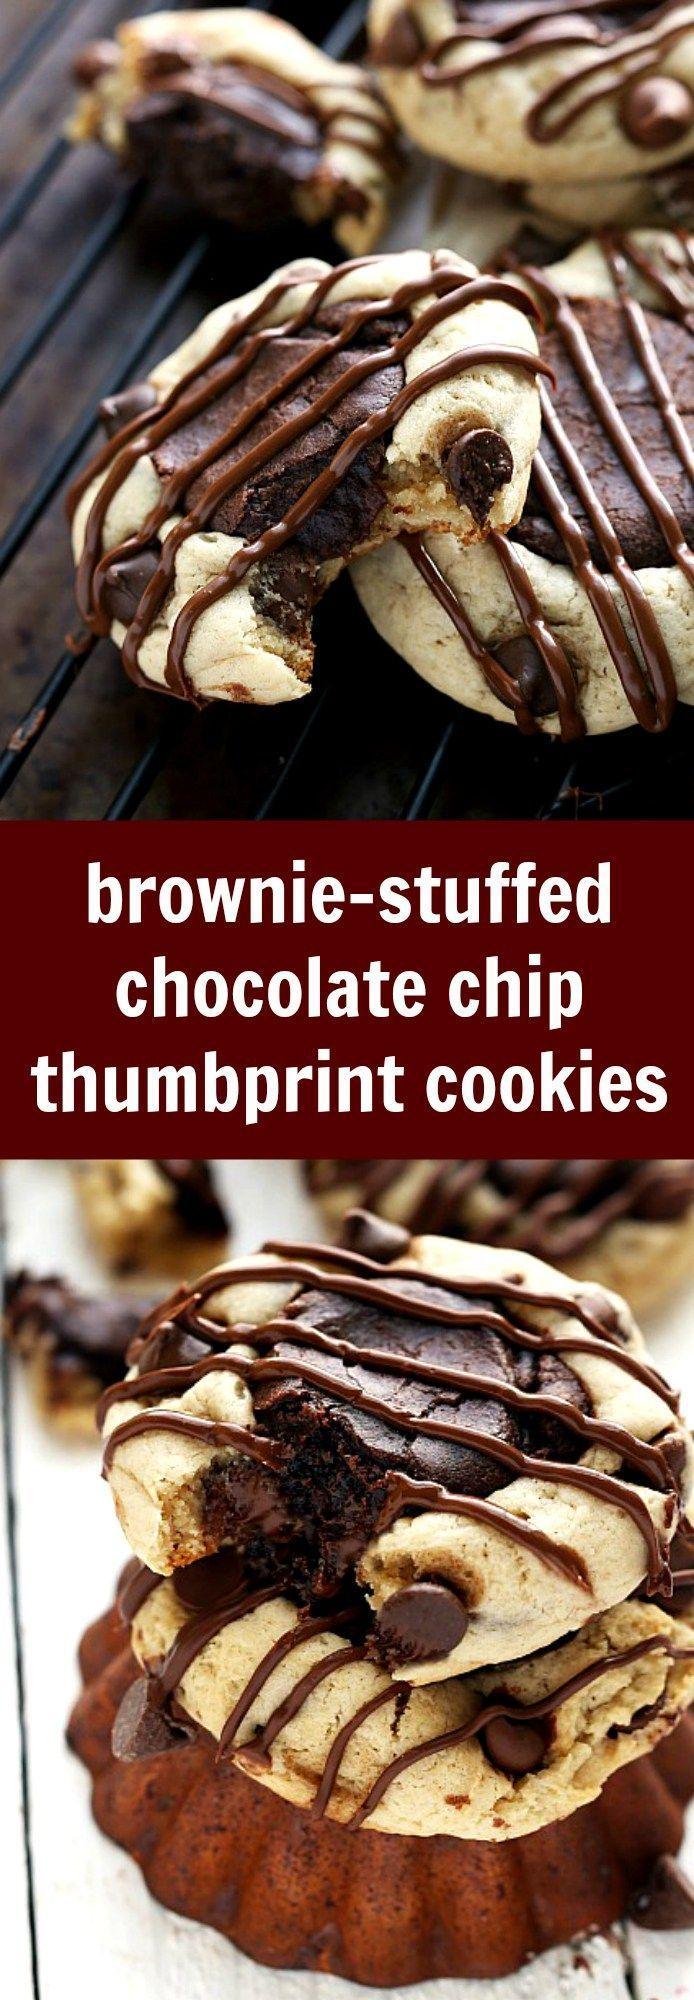 2-ingredient brownie center stuffed inside chocolate-chip cookies. Easy, creativ 2-ingredient brownie center stuffed inside chocolate-chip cookies. Easy, creativ...